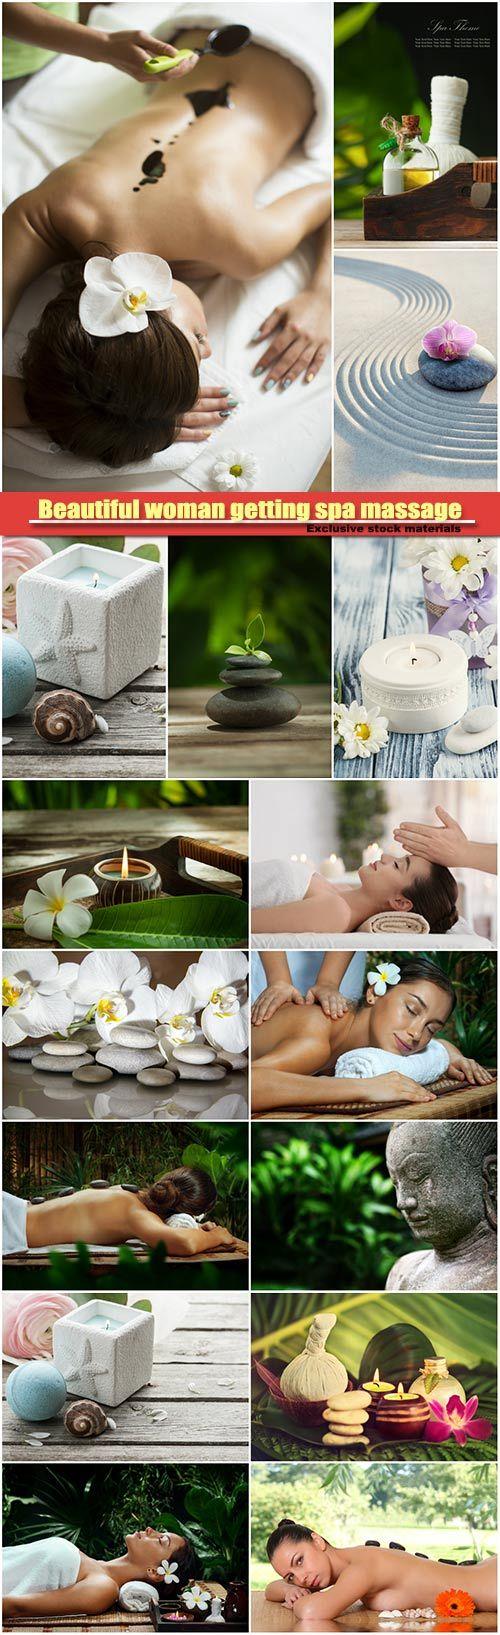 Beautiful woman getting spa massage in spa salon, spa background